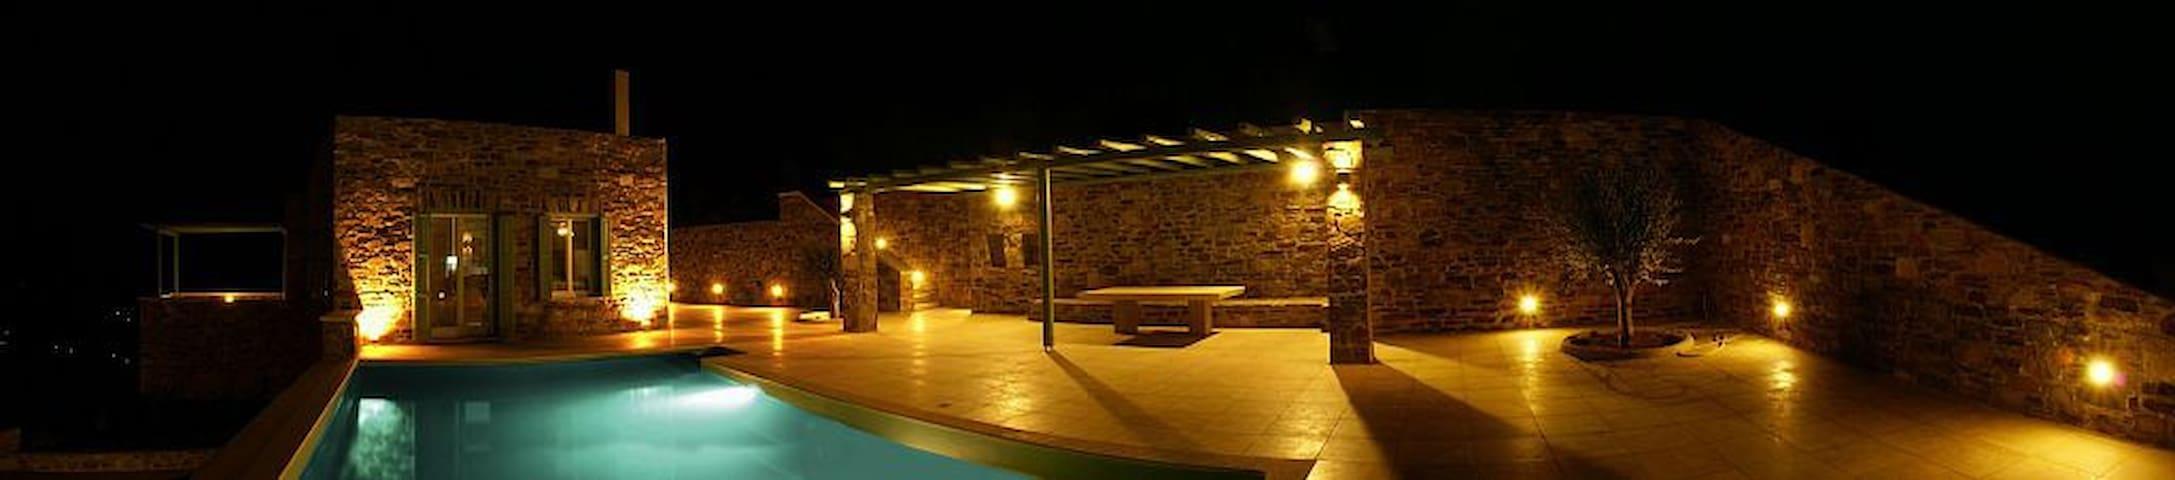 CYCLADES, SYROS, SPLENDIDE VILLA AVEC PISCINE - Kini - House